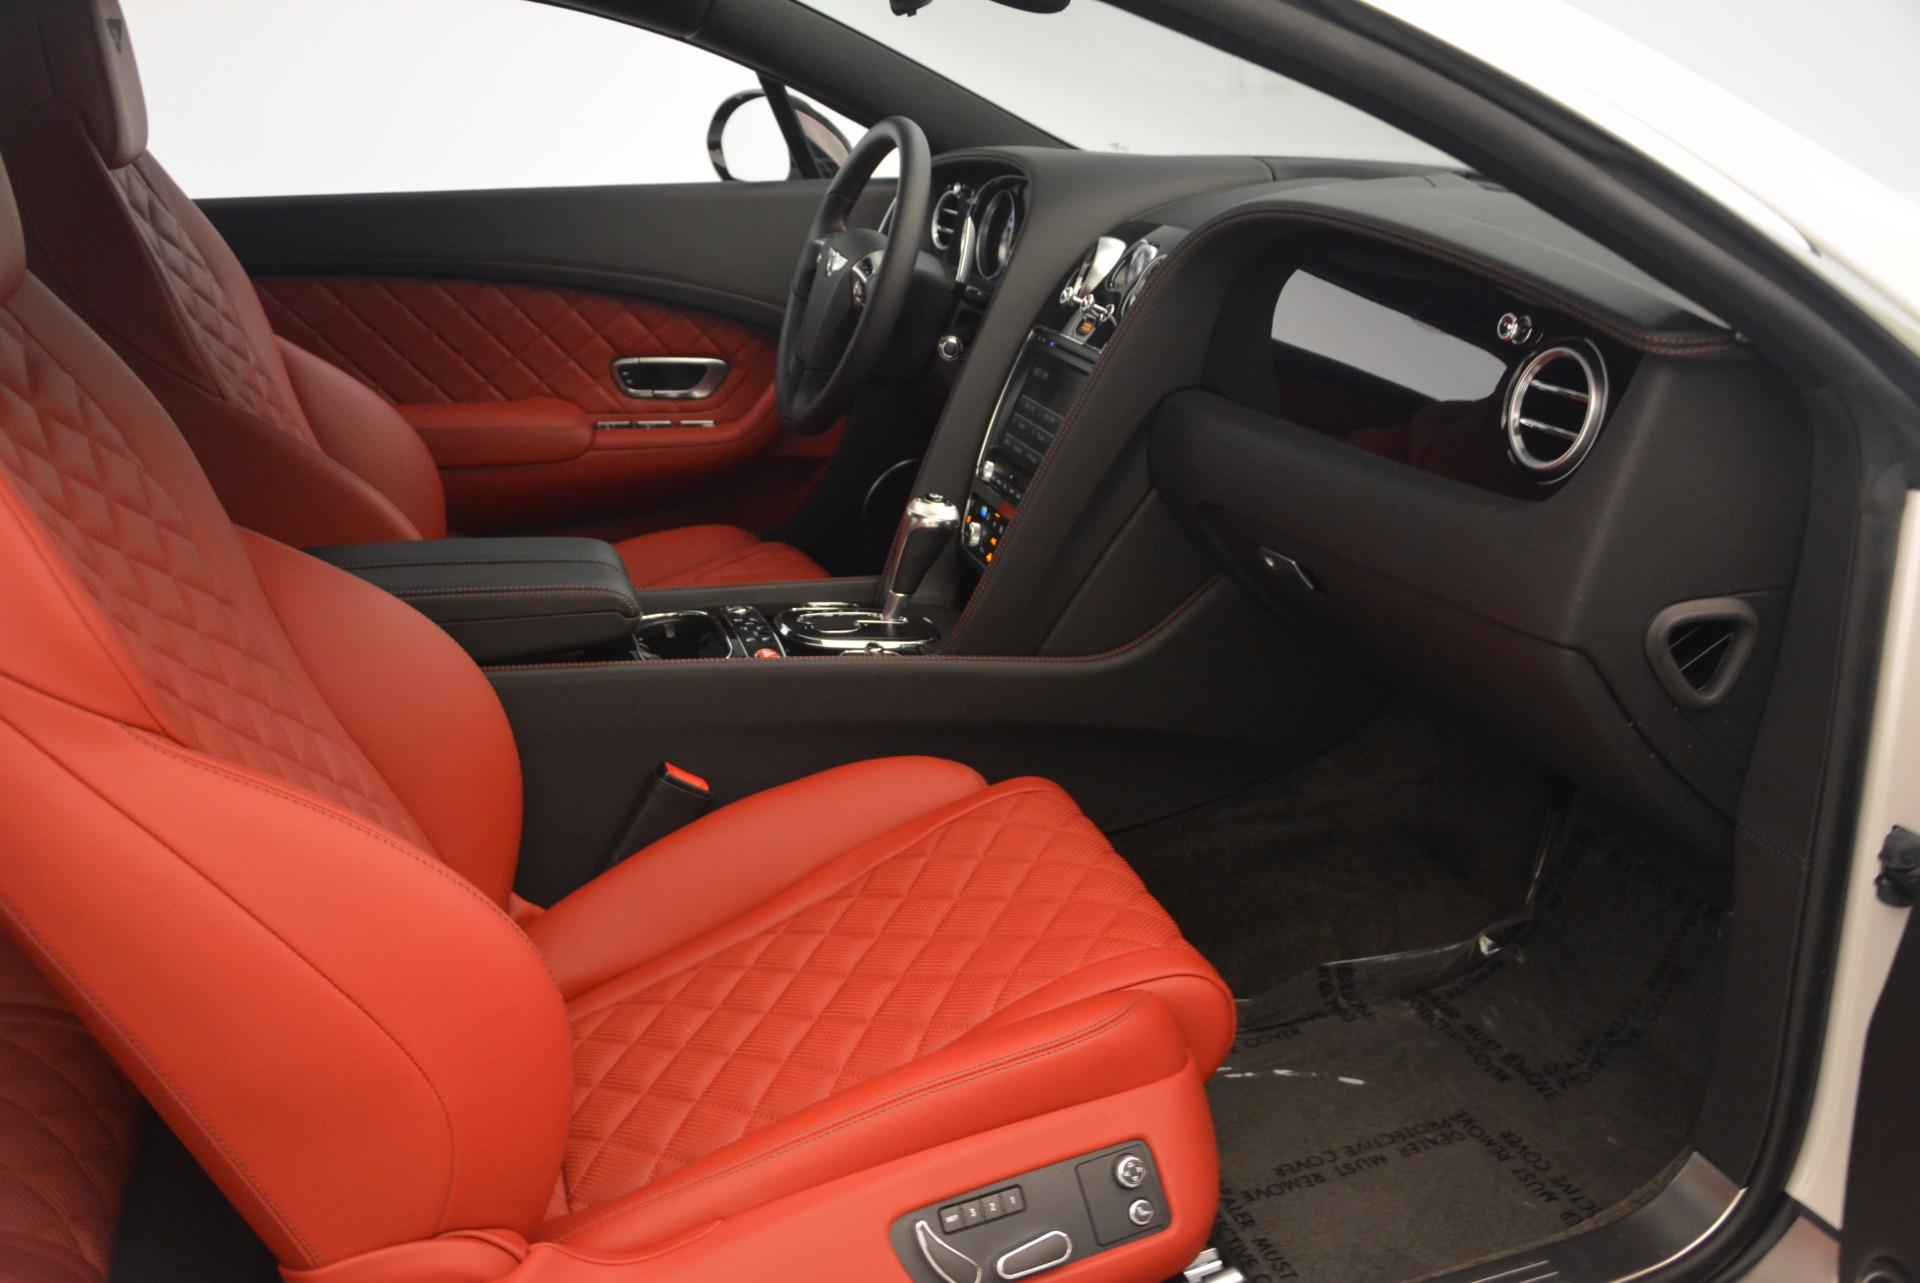 New 2017 Bentley Continental GT V8 S For Sale In Westport, CT 1384_p36